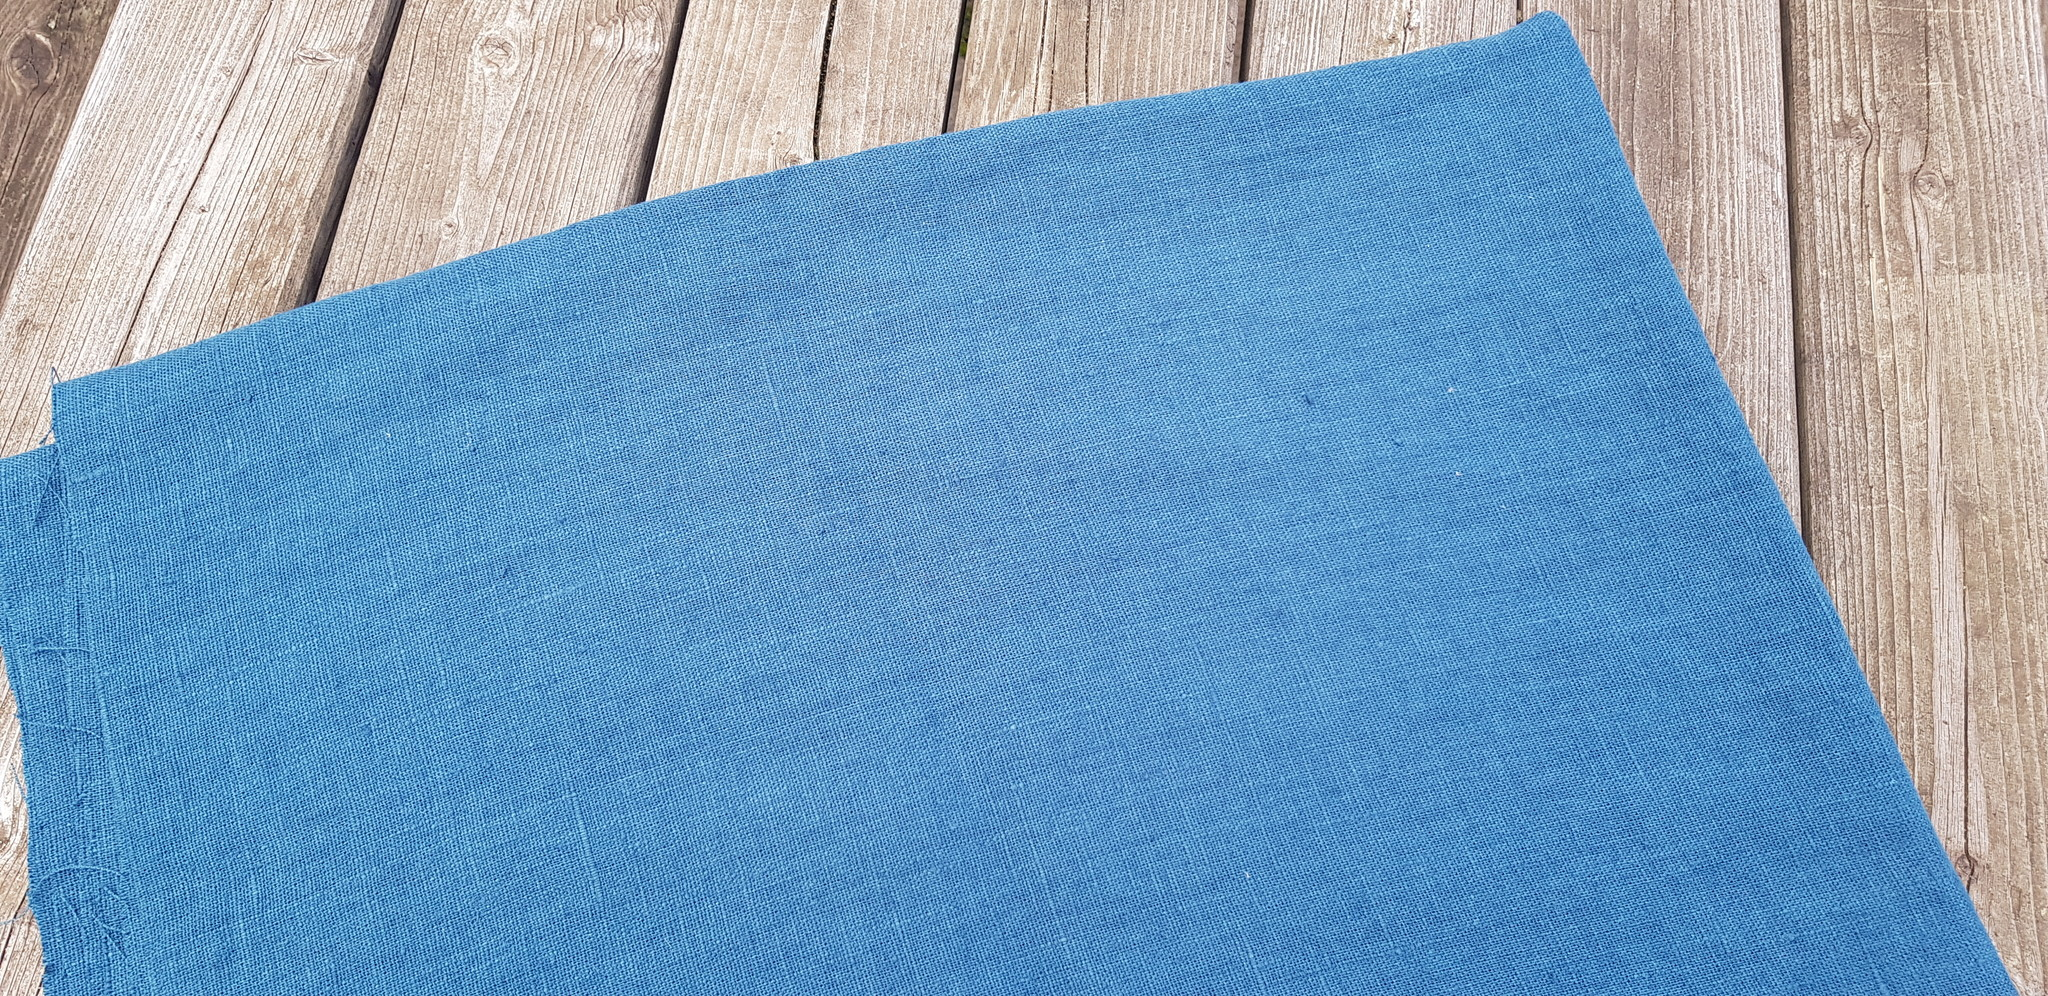 Le grenier du lin tissu lin lavé